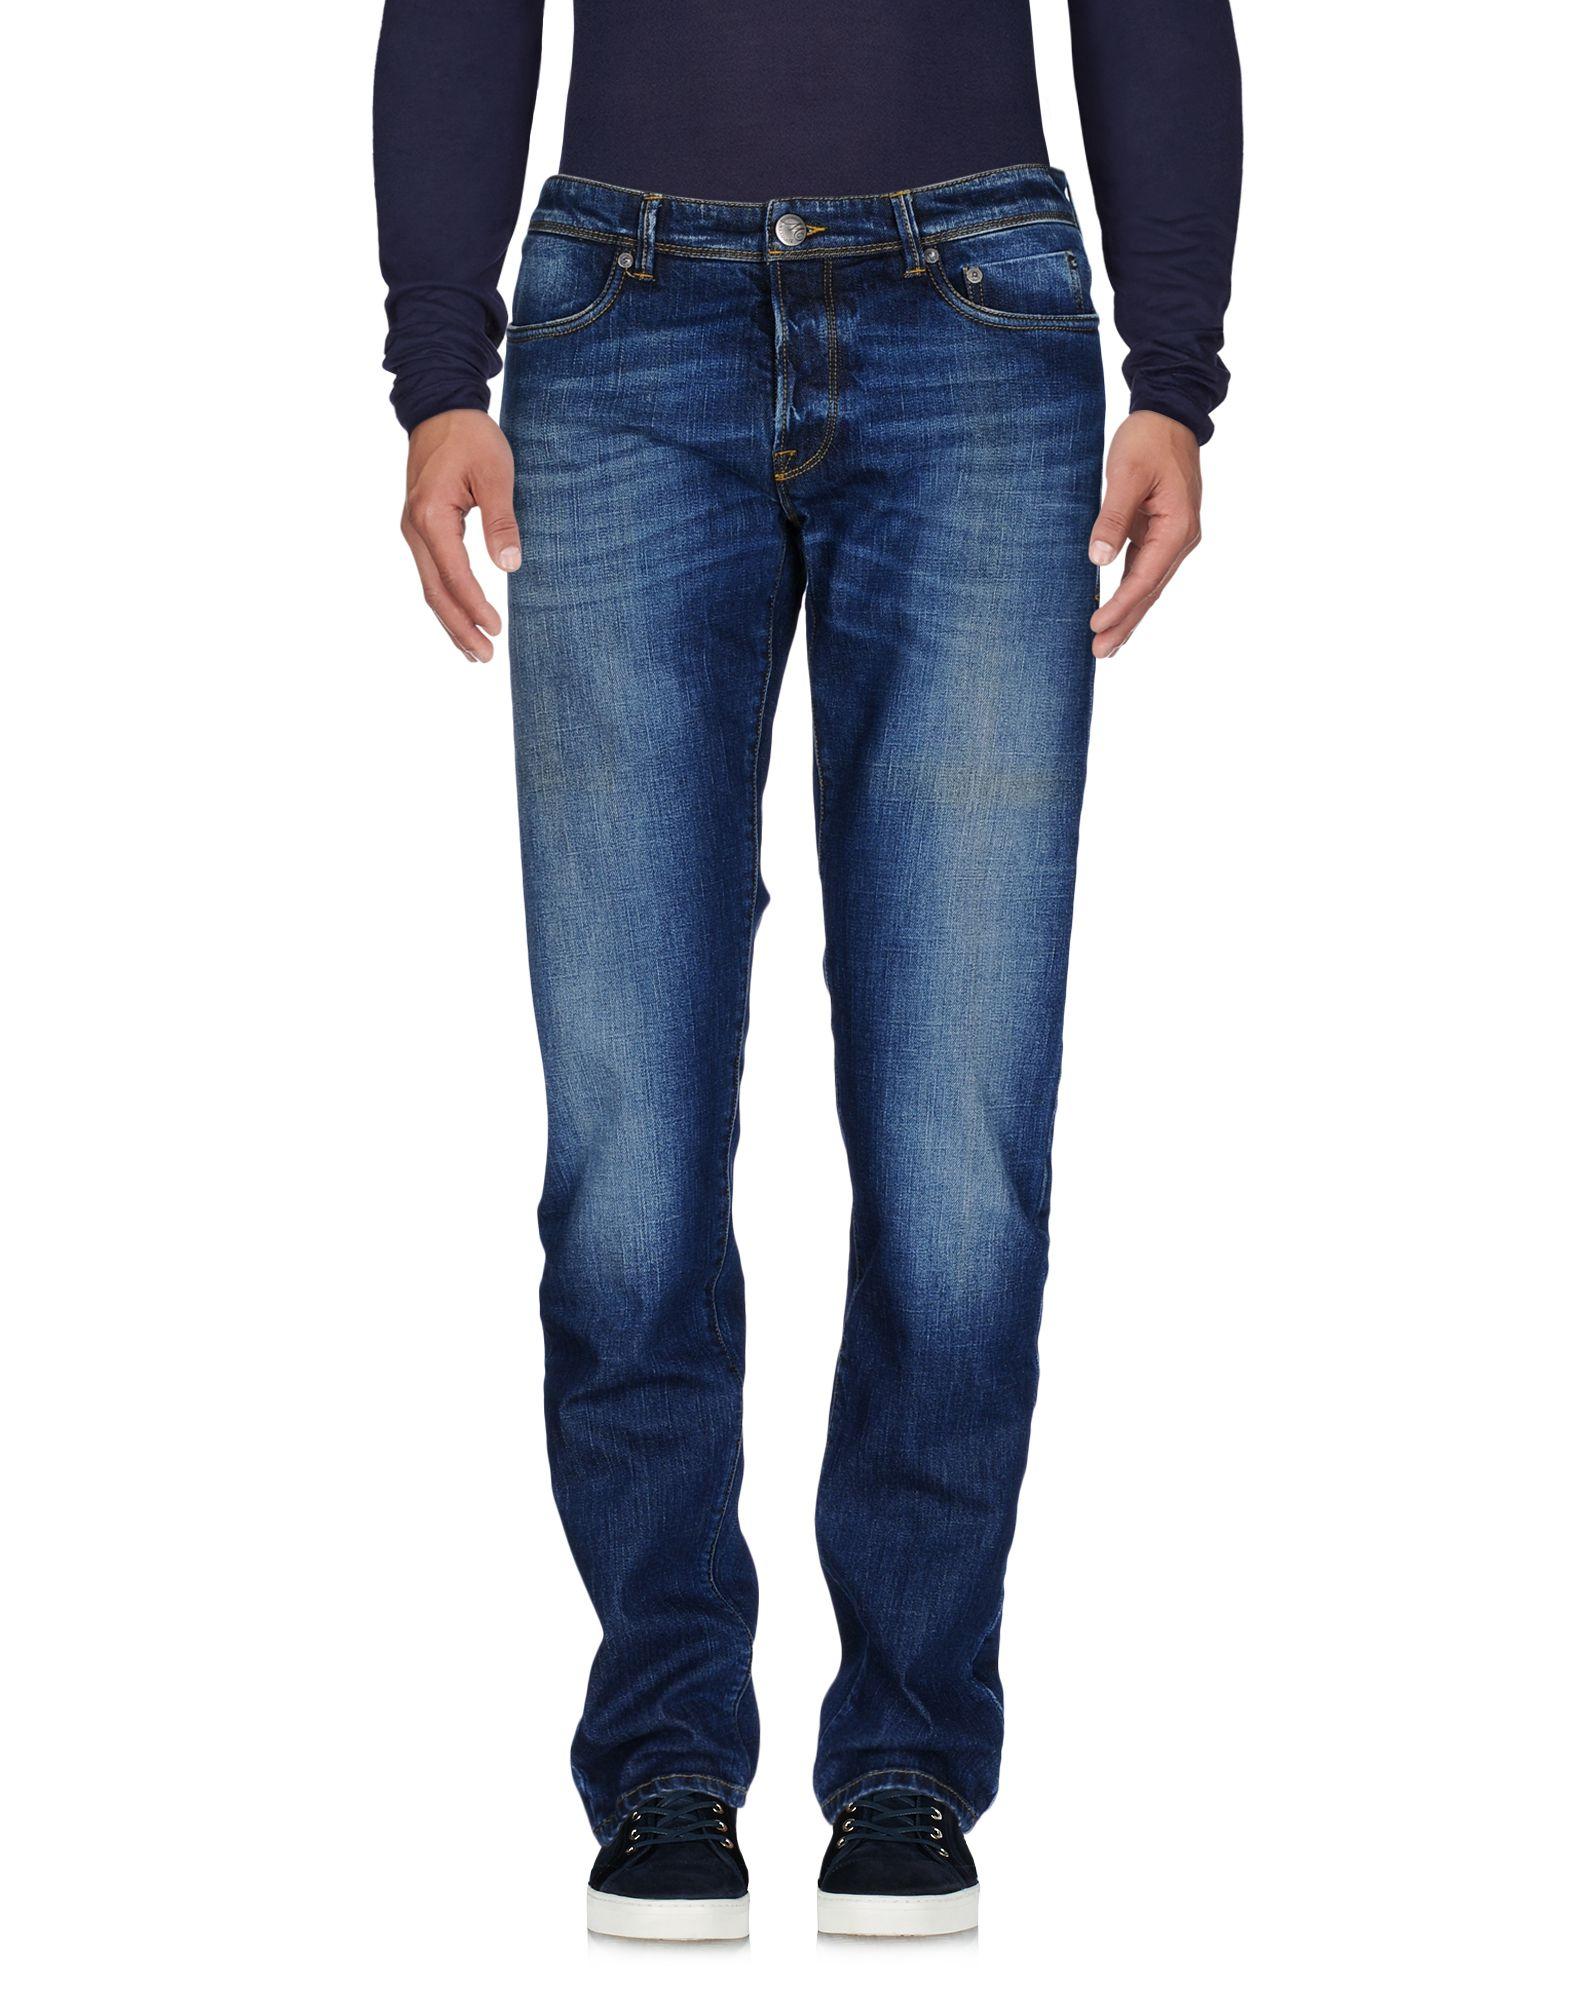 Pantaloni Jeans Siviglia bianca - Uomo - bianca 42602203WB eda5ee